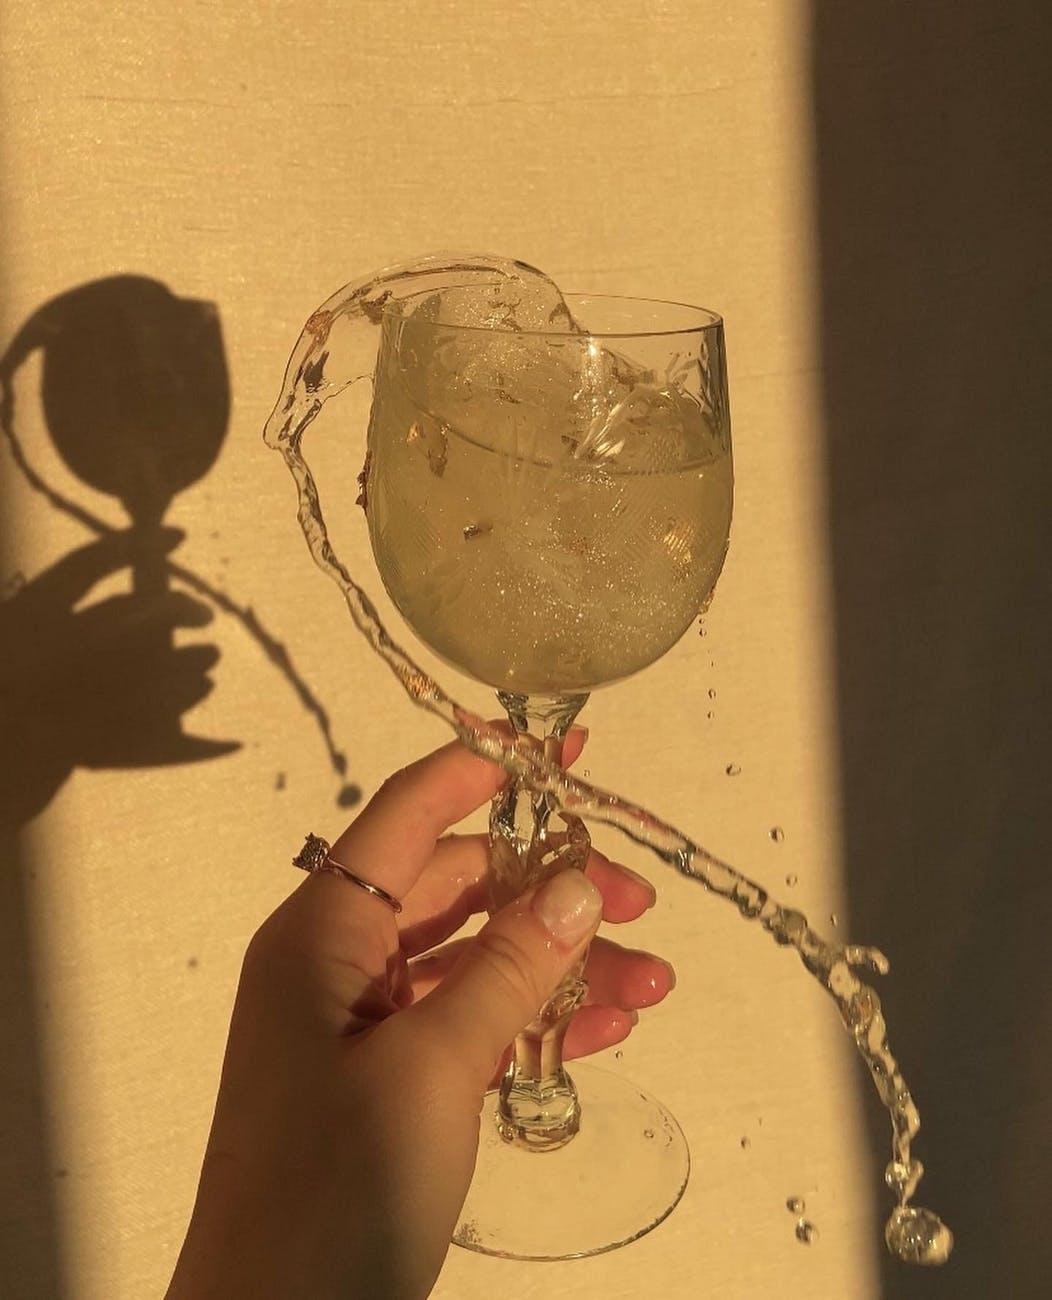 crop woman with splashing drink